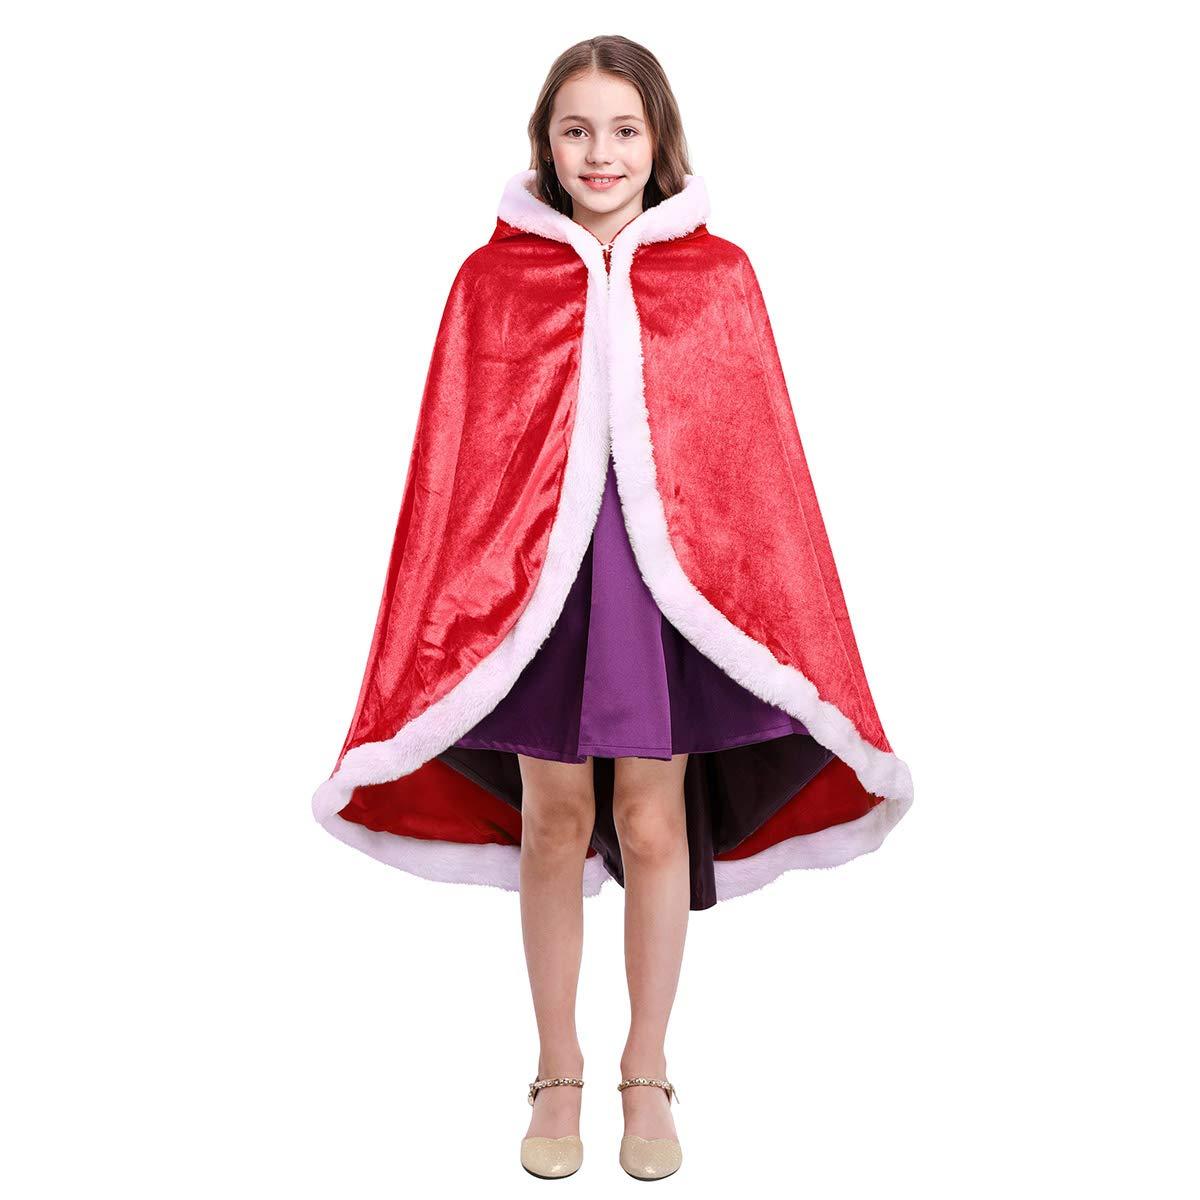 IMEKIS Kid Girls Hooded Cloak Princess Queen Cinderella Belle Rapunzel Birthday Party Cosplay Outfit Halloween Fancy Dress Up Costume Winter Velvet Cape Long Robe Coat Outwear